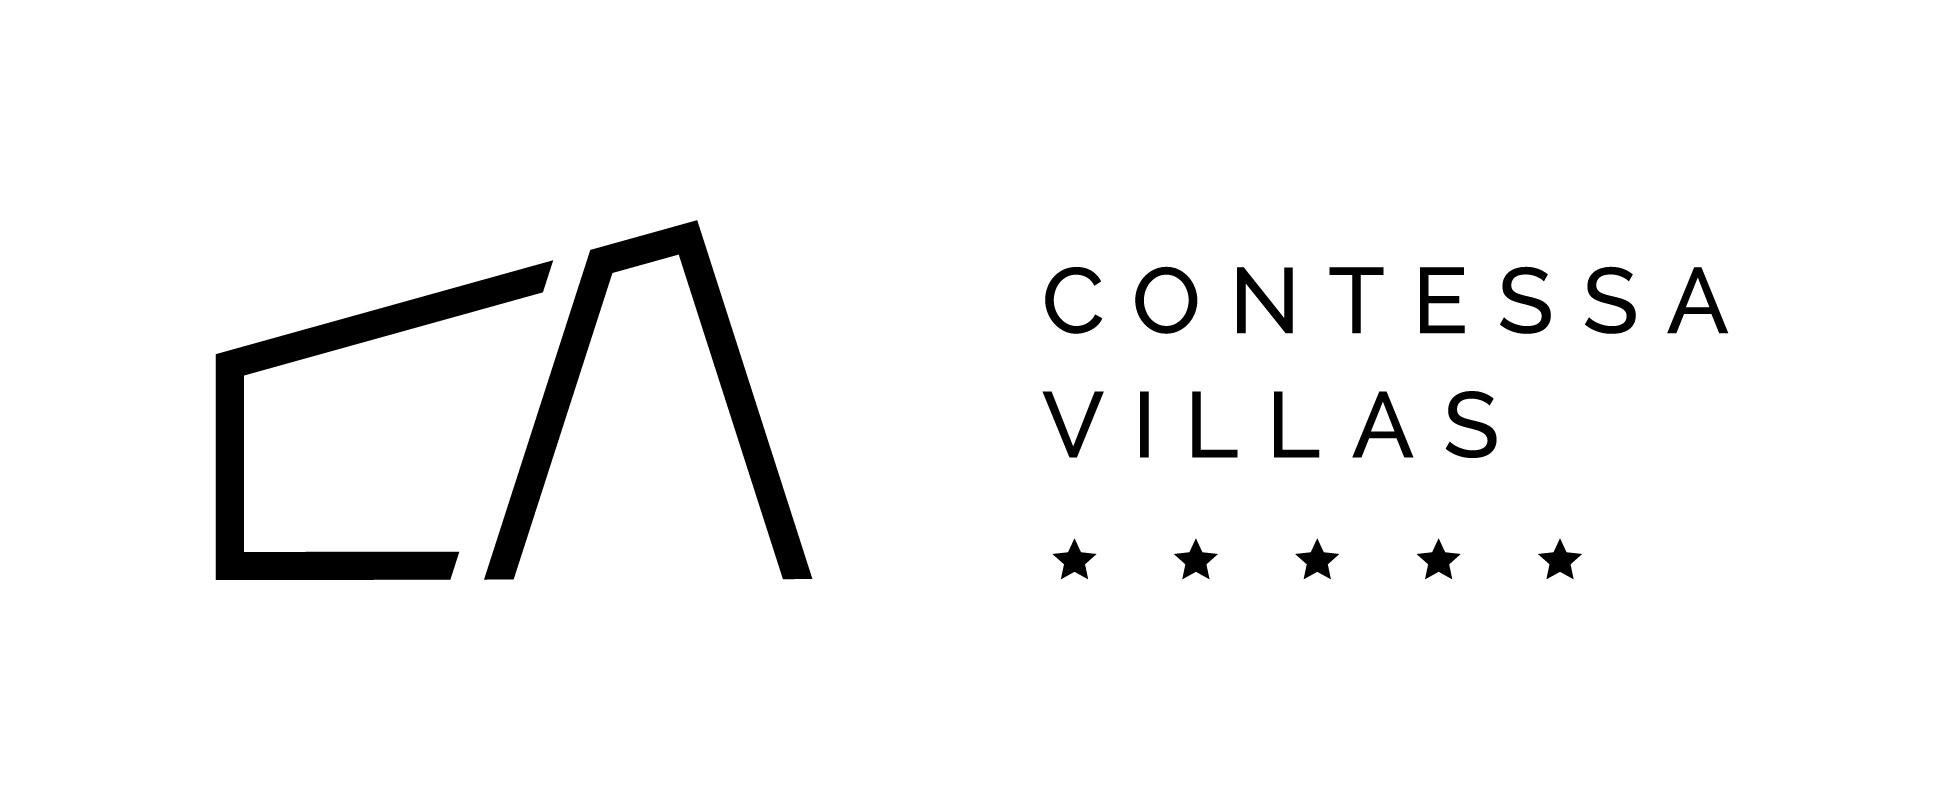 Prepustite posao profesionalcima, surađujte s Contessom!